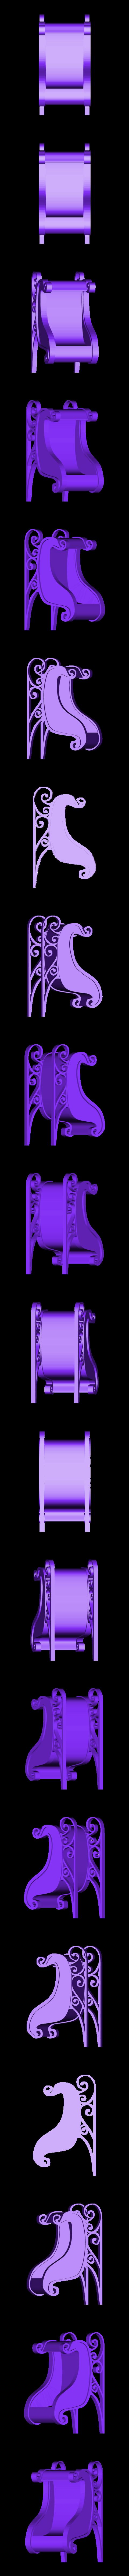 CreativeTools.se_-_ZPrinter-model_-_Santas_sleigh.stl Download free STL file Santa's sleigh • 3D print design, CreativeTools